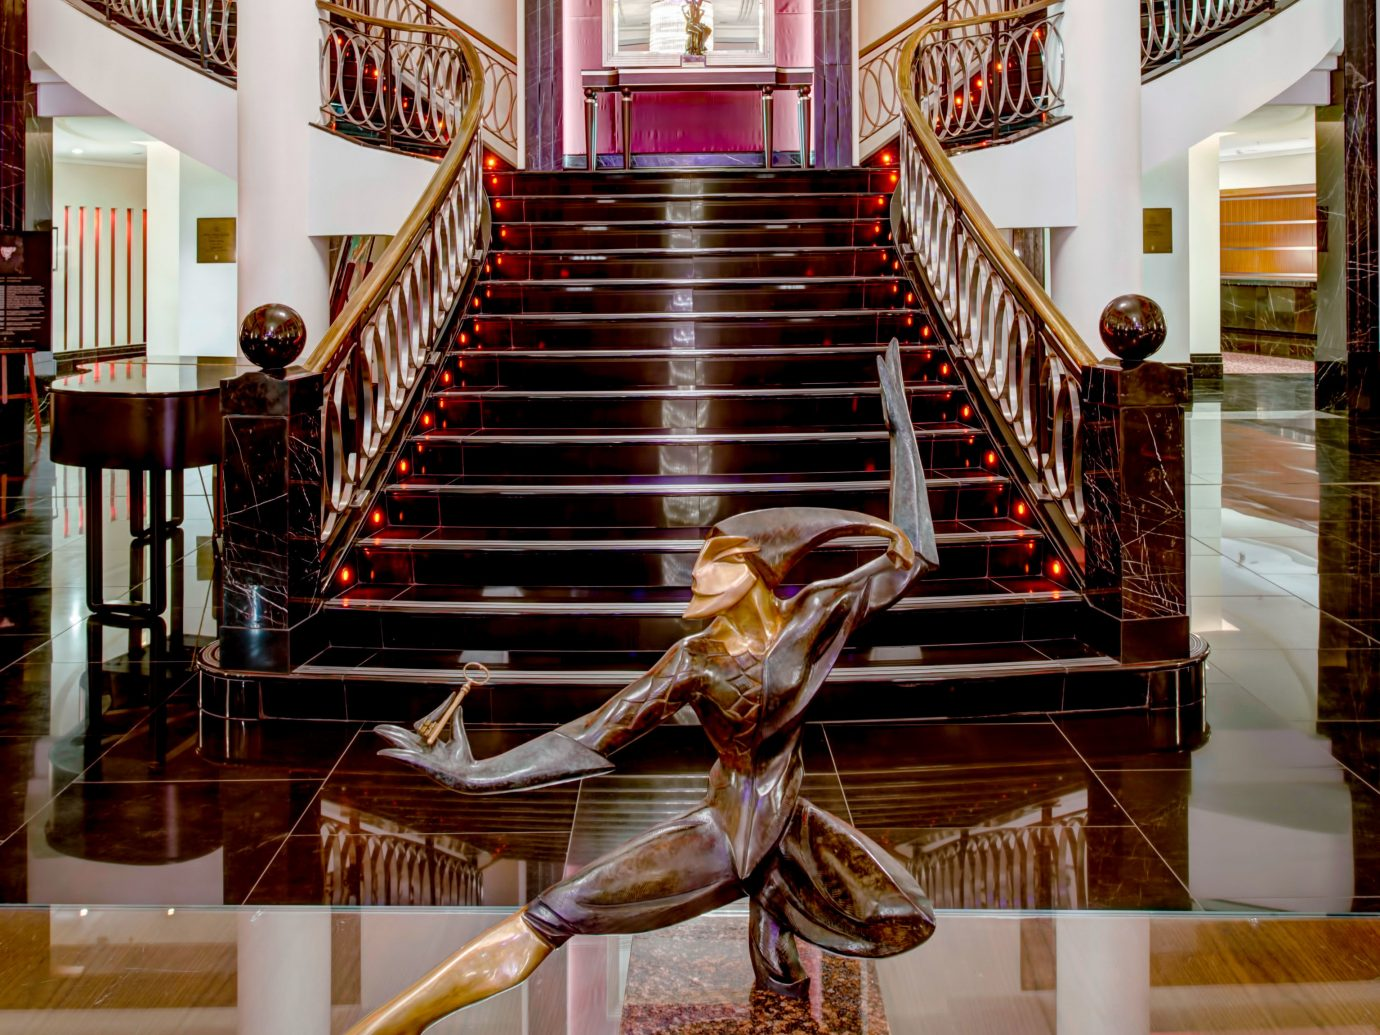 Hotels Luxury Travel indoor stairs interior design flooring Lobby tourist attraction furniture wood handrail hardwood floor